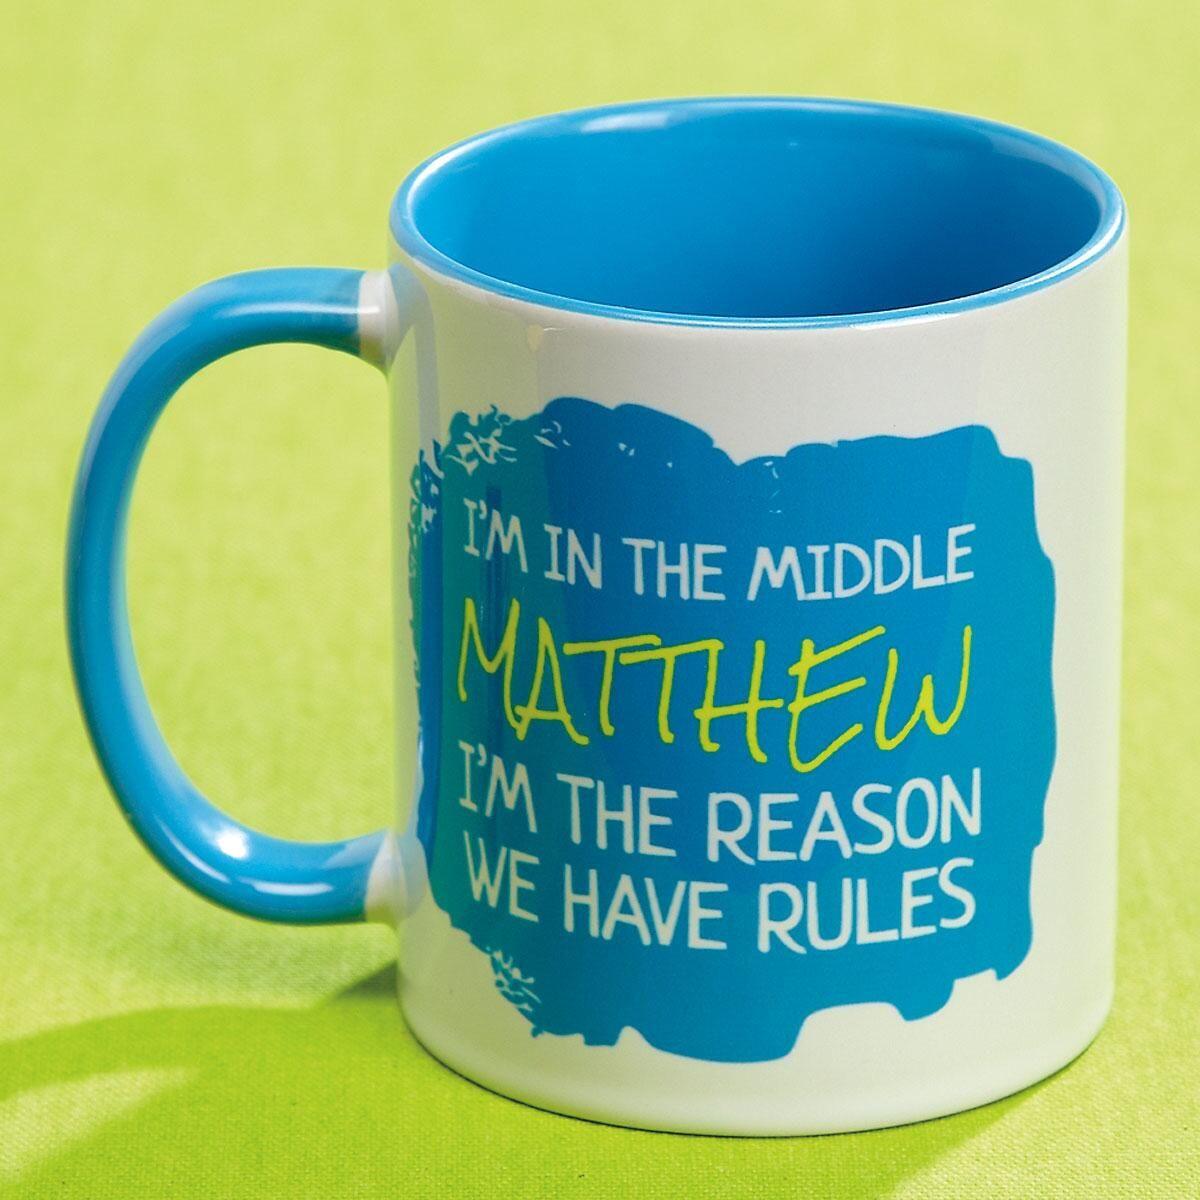 Middle Child Personalized Mug Rules